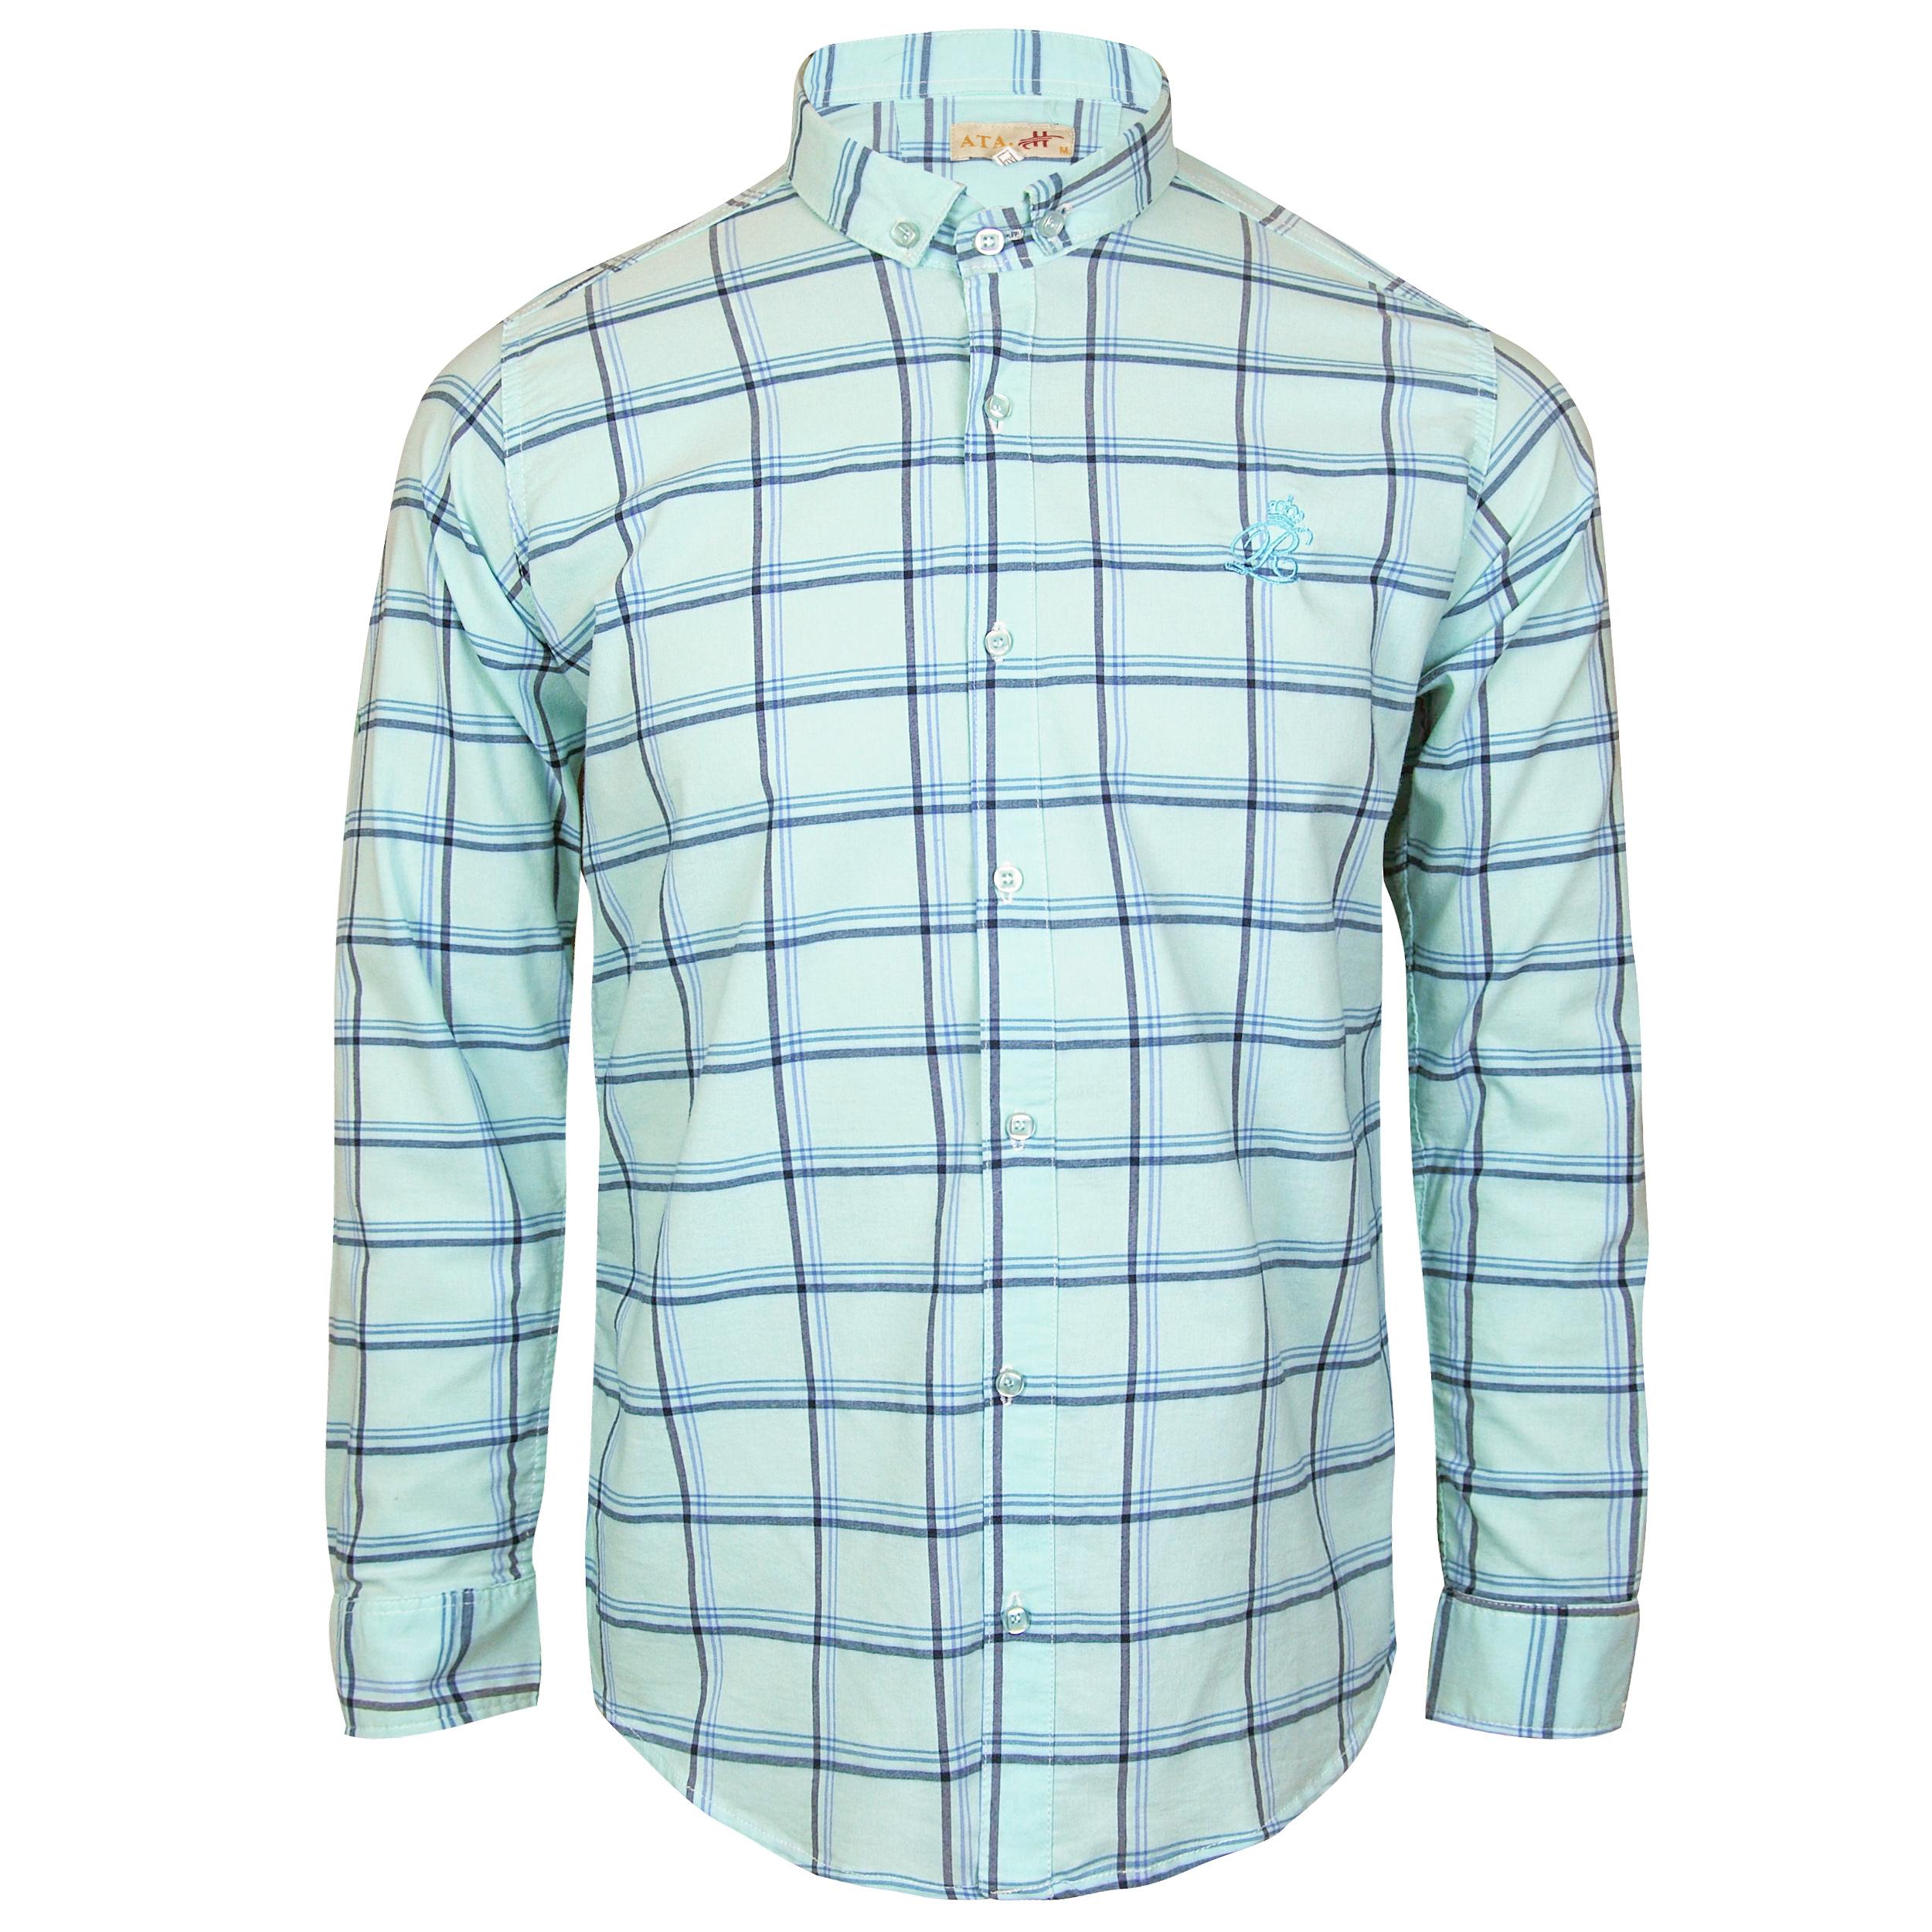 پیراهن مردانه کد 3230-07